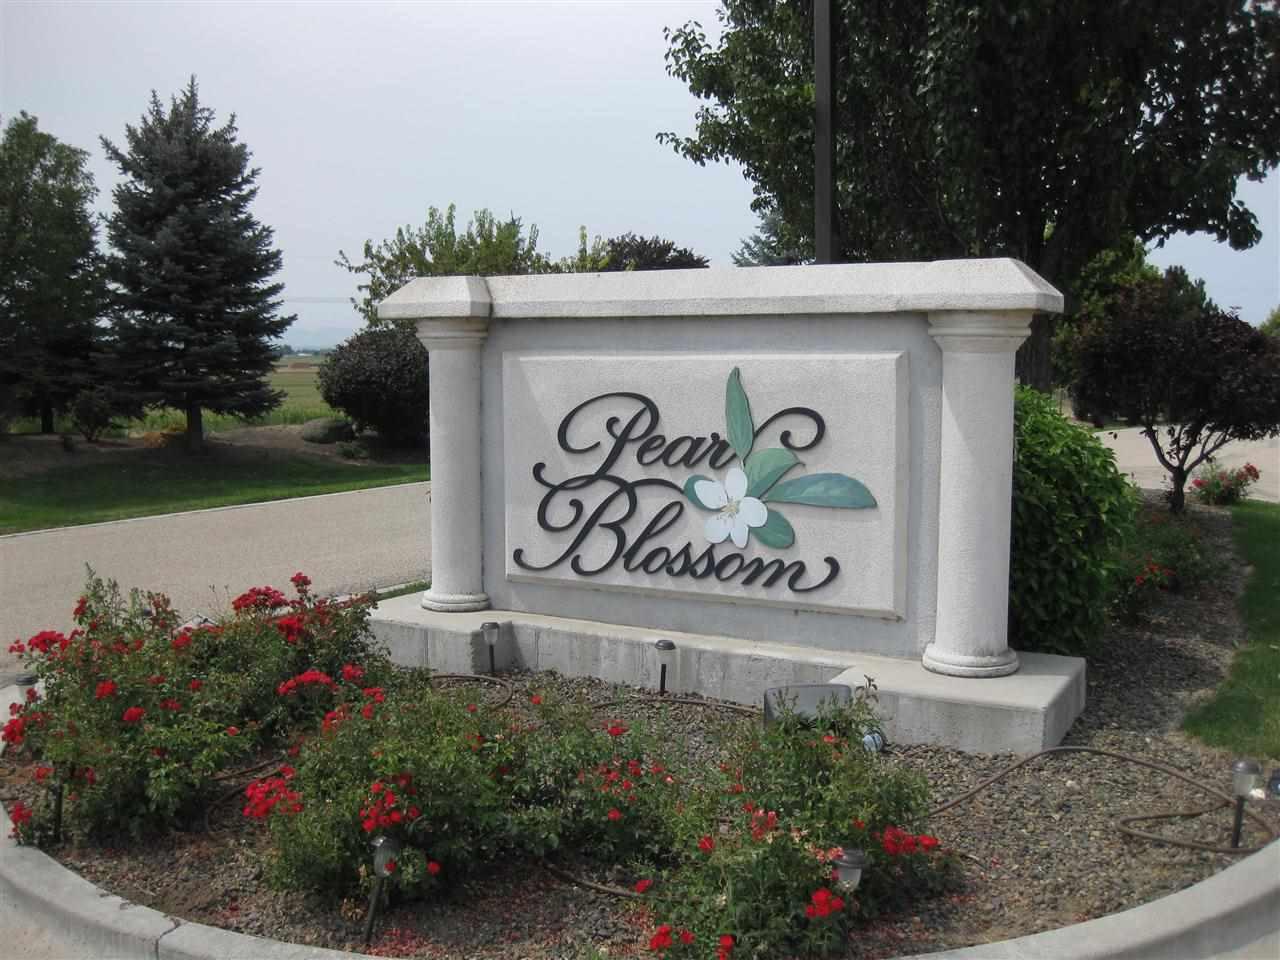 7063 S Pear Blossom Way, Meridian, ID 83642